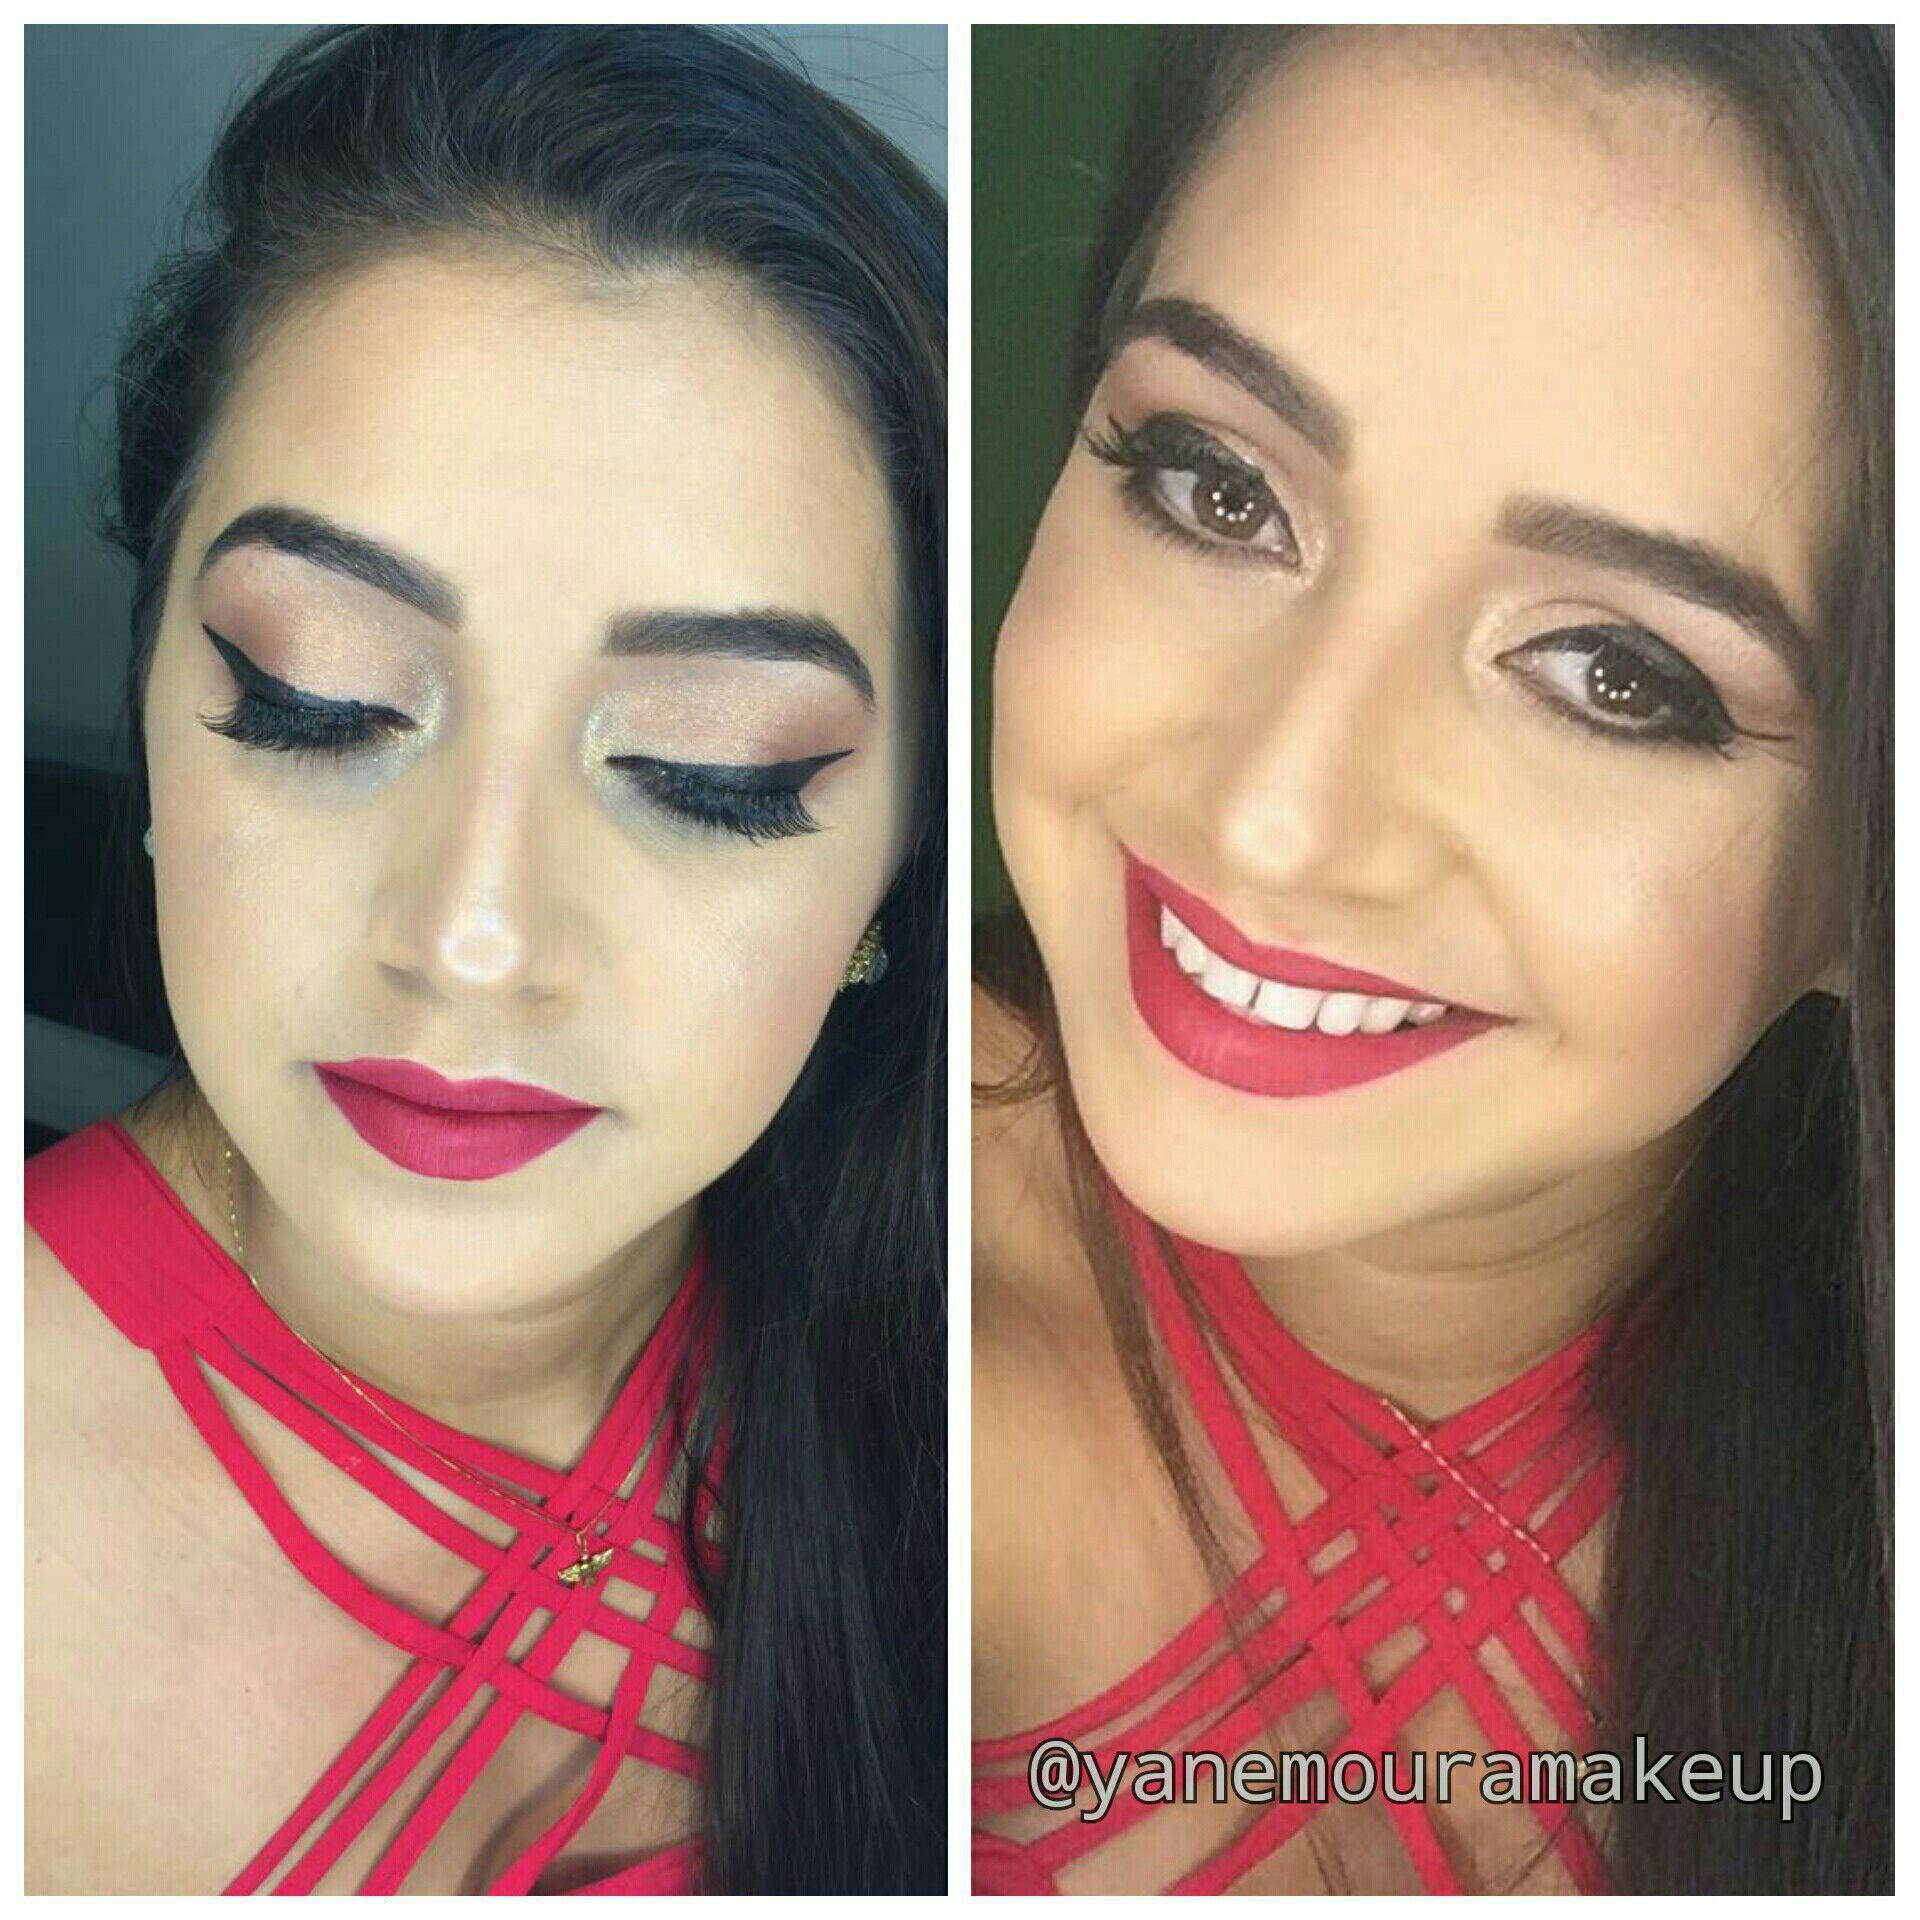 maquiagem maquiador(a) stylist / visagista